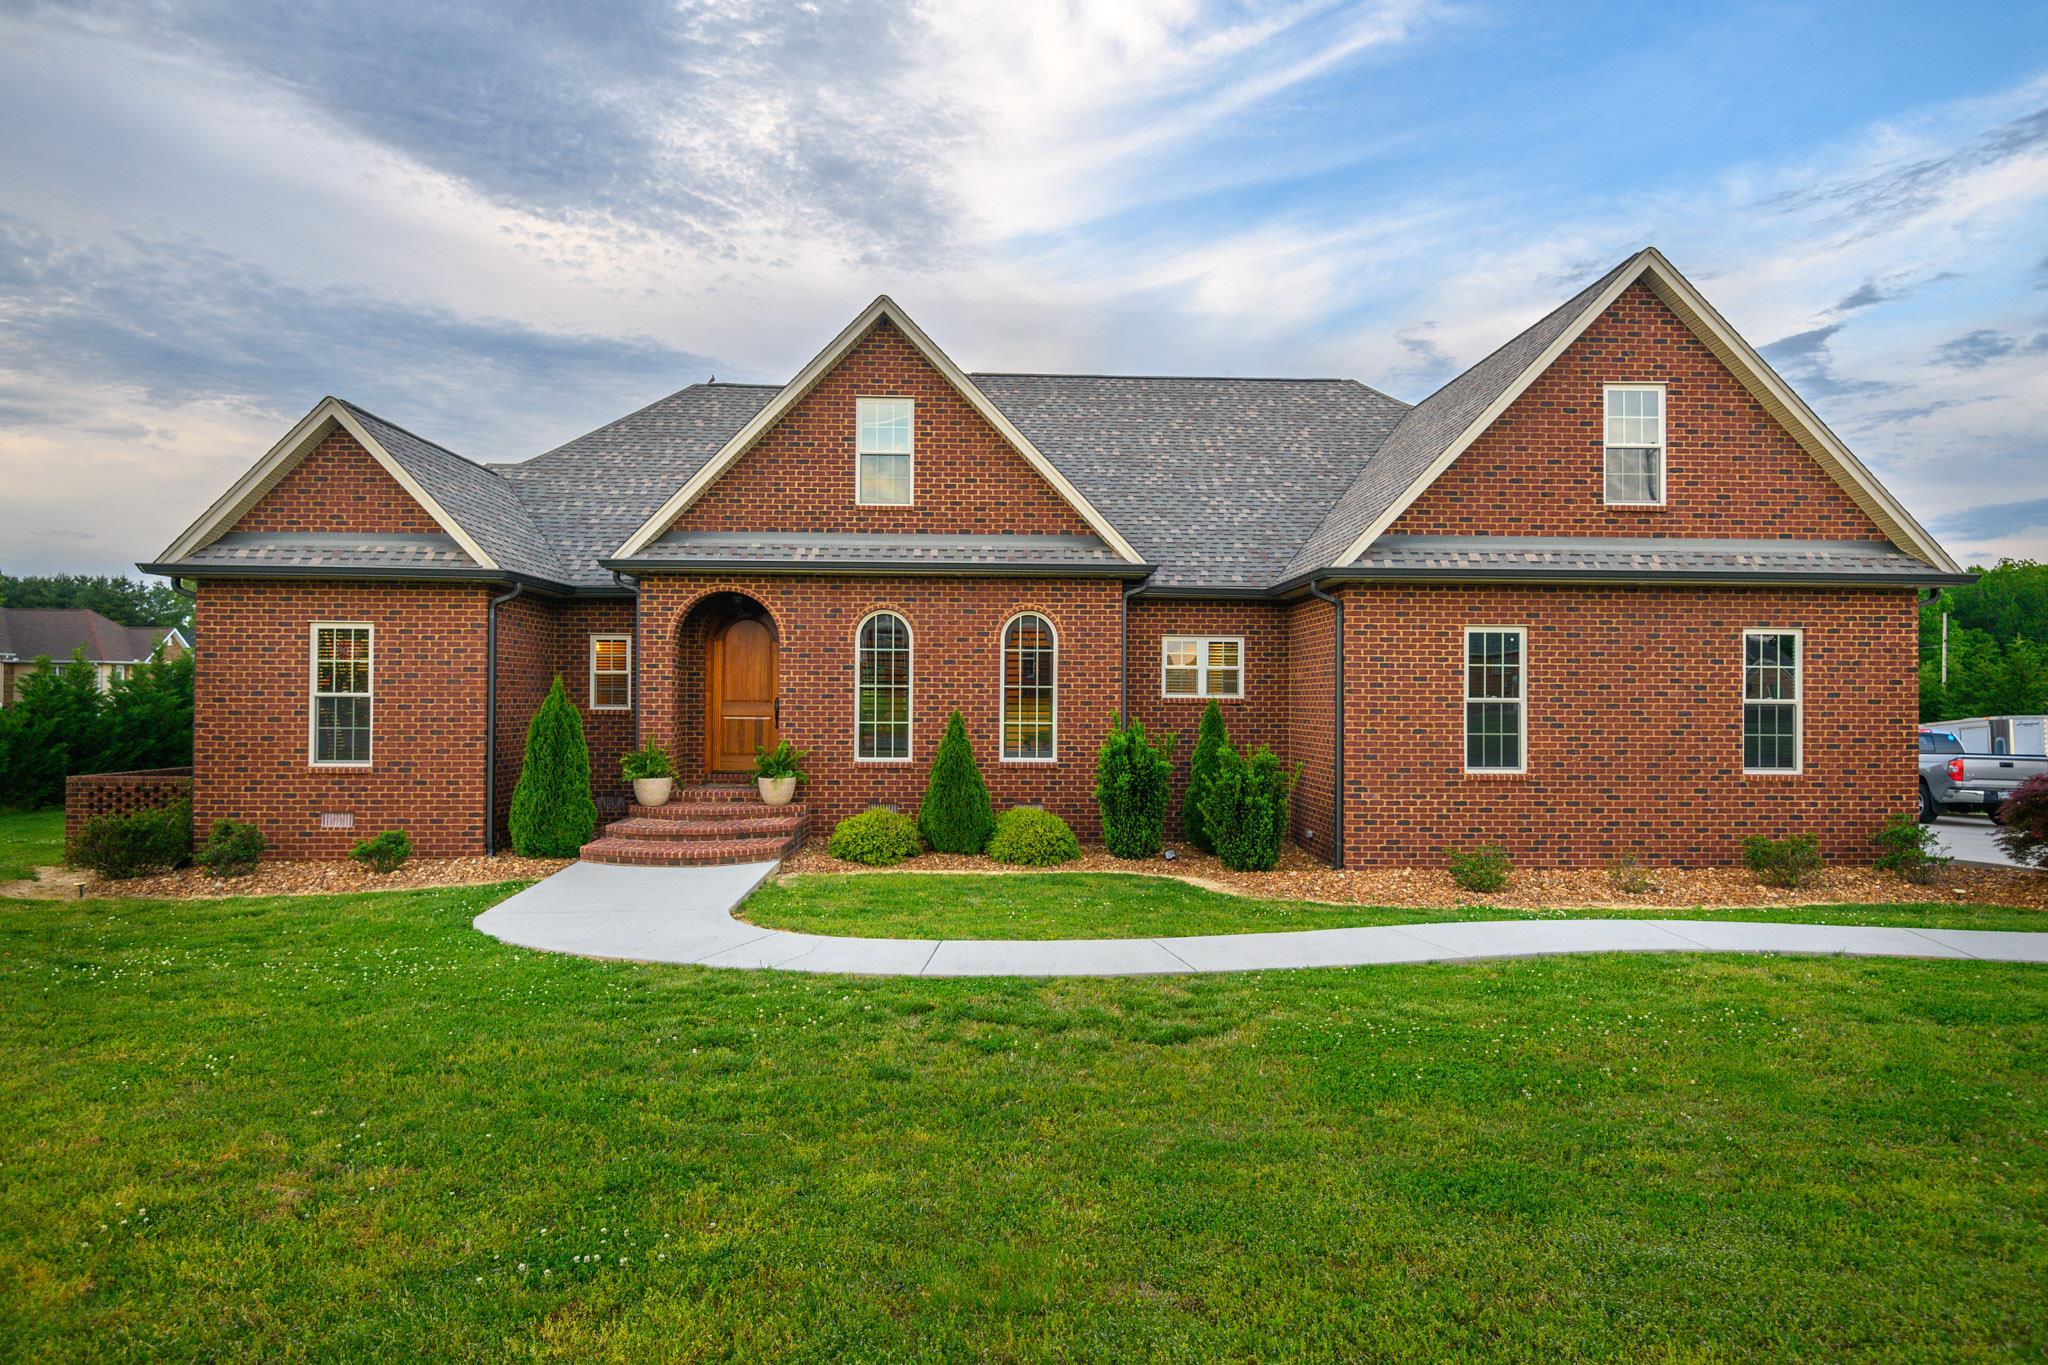 101 ROSEHAVEN COURT, Tullahoma, TN 37388 - Tullahoma, TN real estate listing